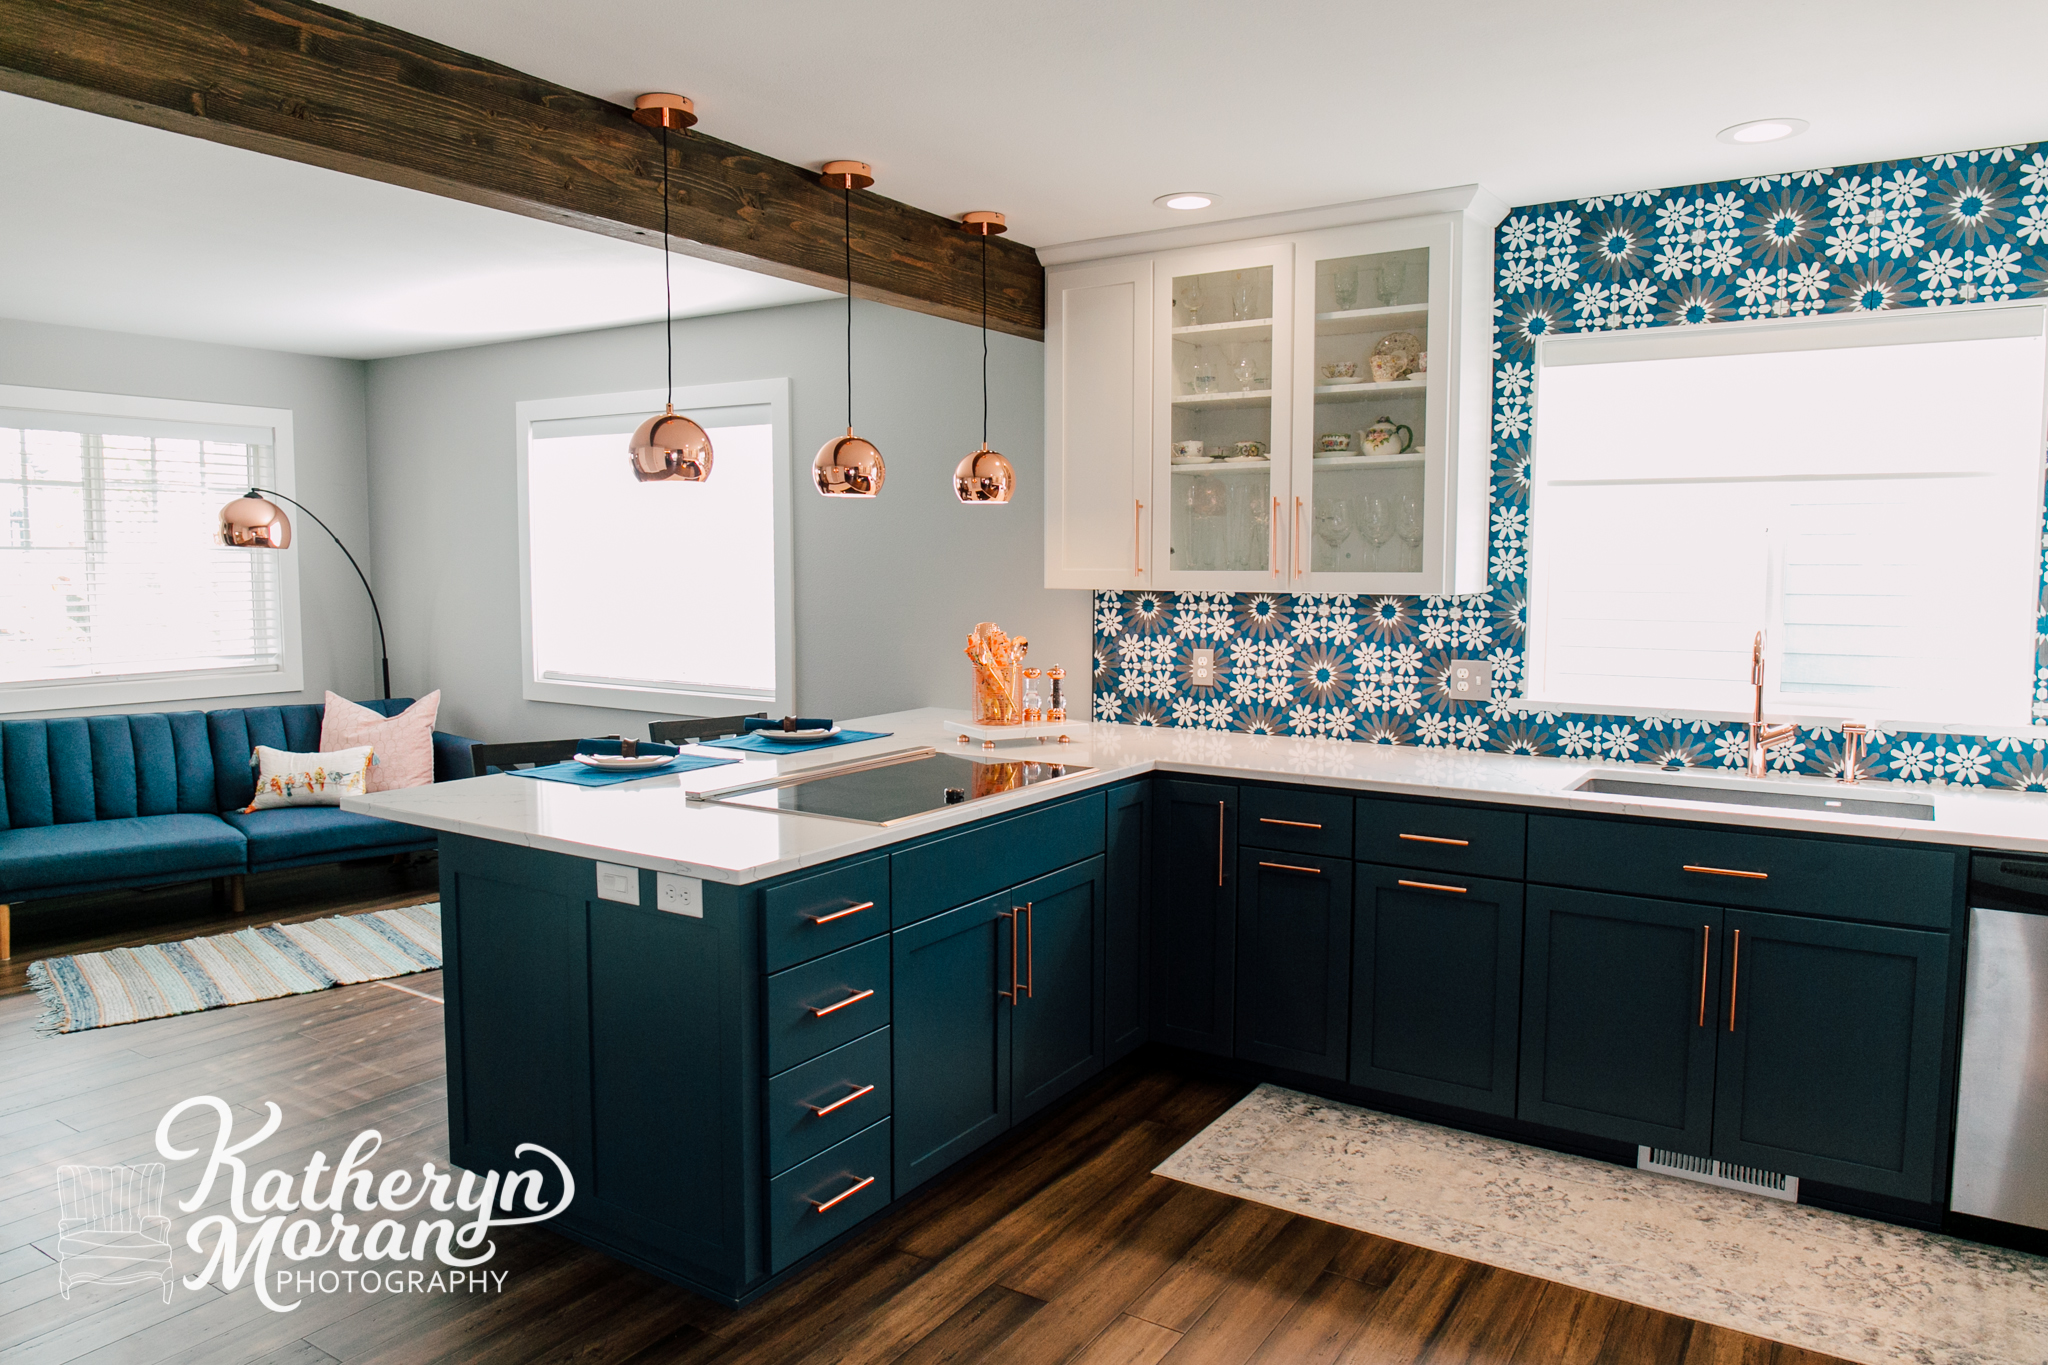 bellingham-interior-design-photographer-jennifer-ryan-ferndale-october-2018-5.jpg